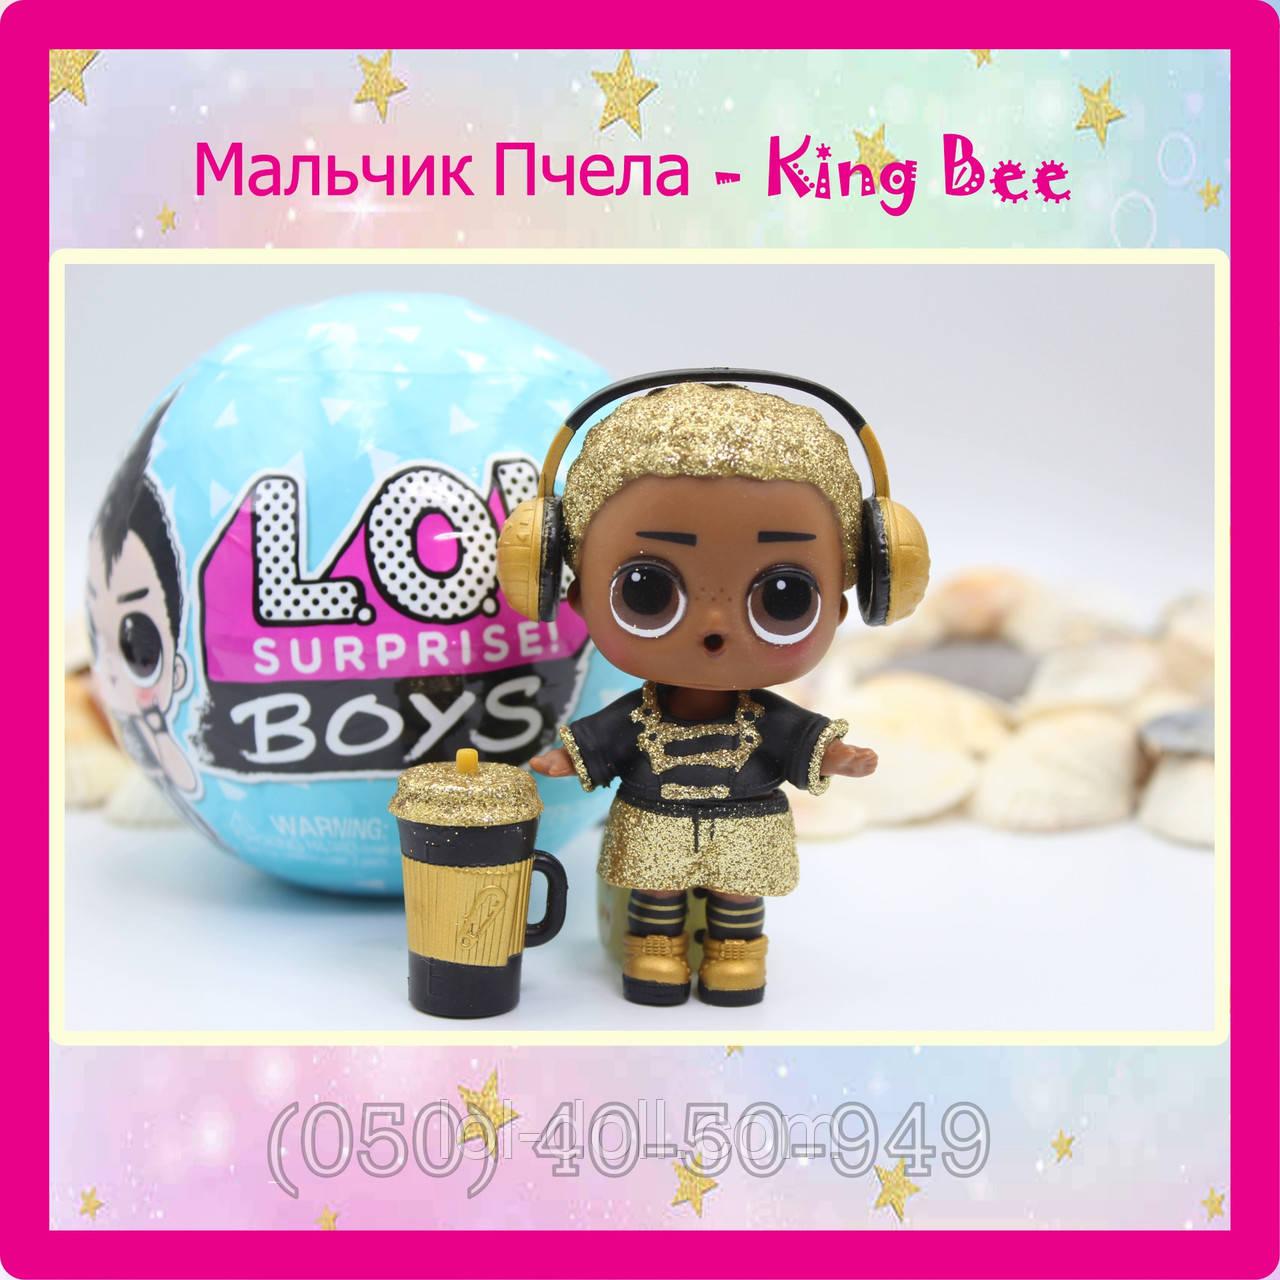 Лялька Лол Сюрприз Серія Хлопчик Бджола - Queen Bee LOL Surprise Оригінал